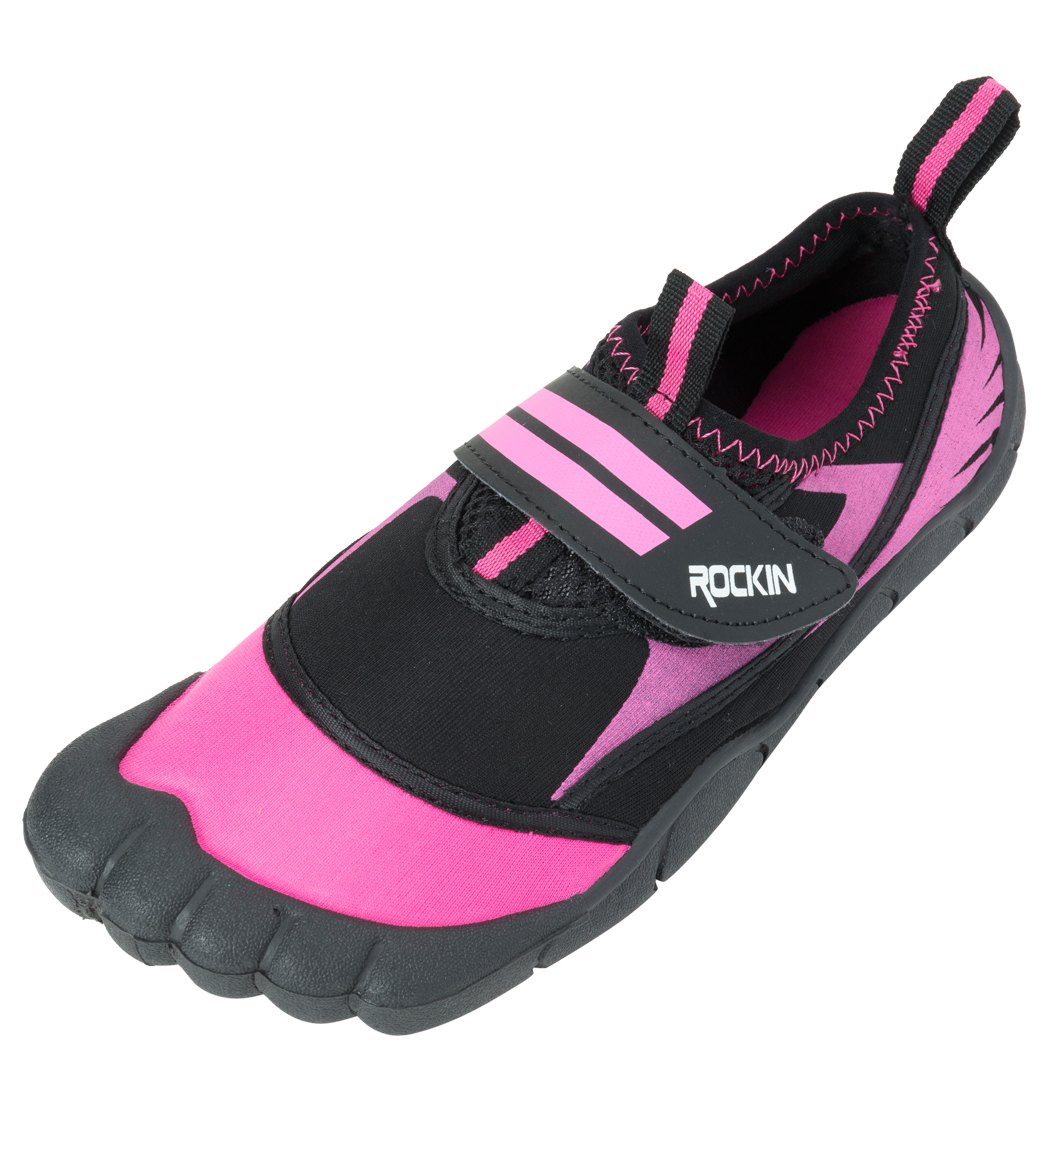 6ecd66c57980 Rockin Footwear Kids  Aqua Foot Water Shoes at SwimOutlet.com